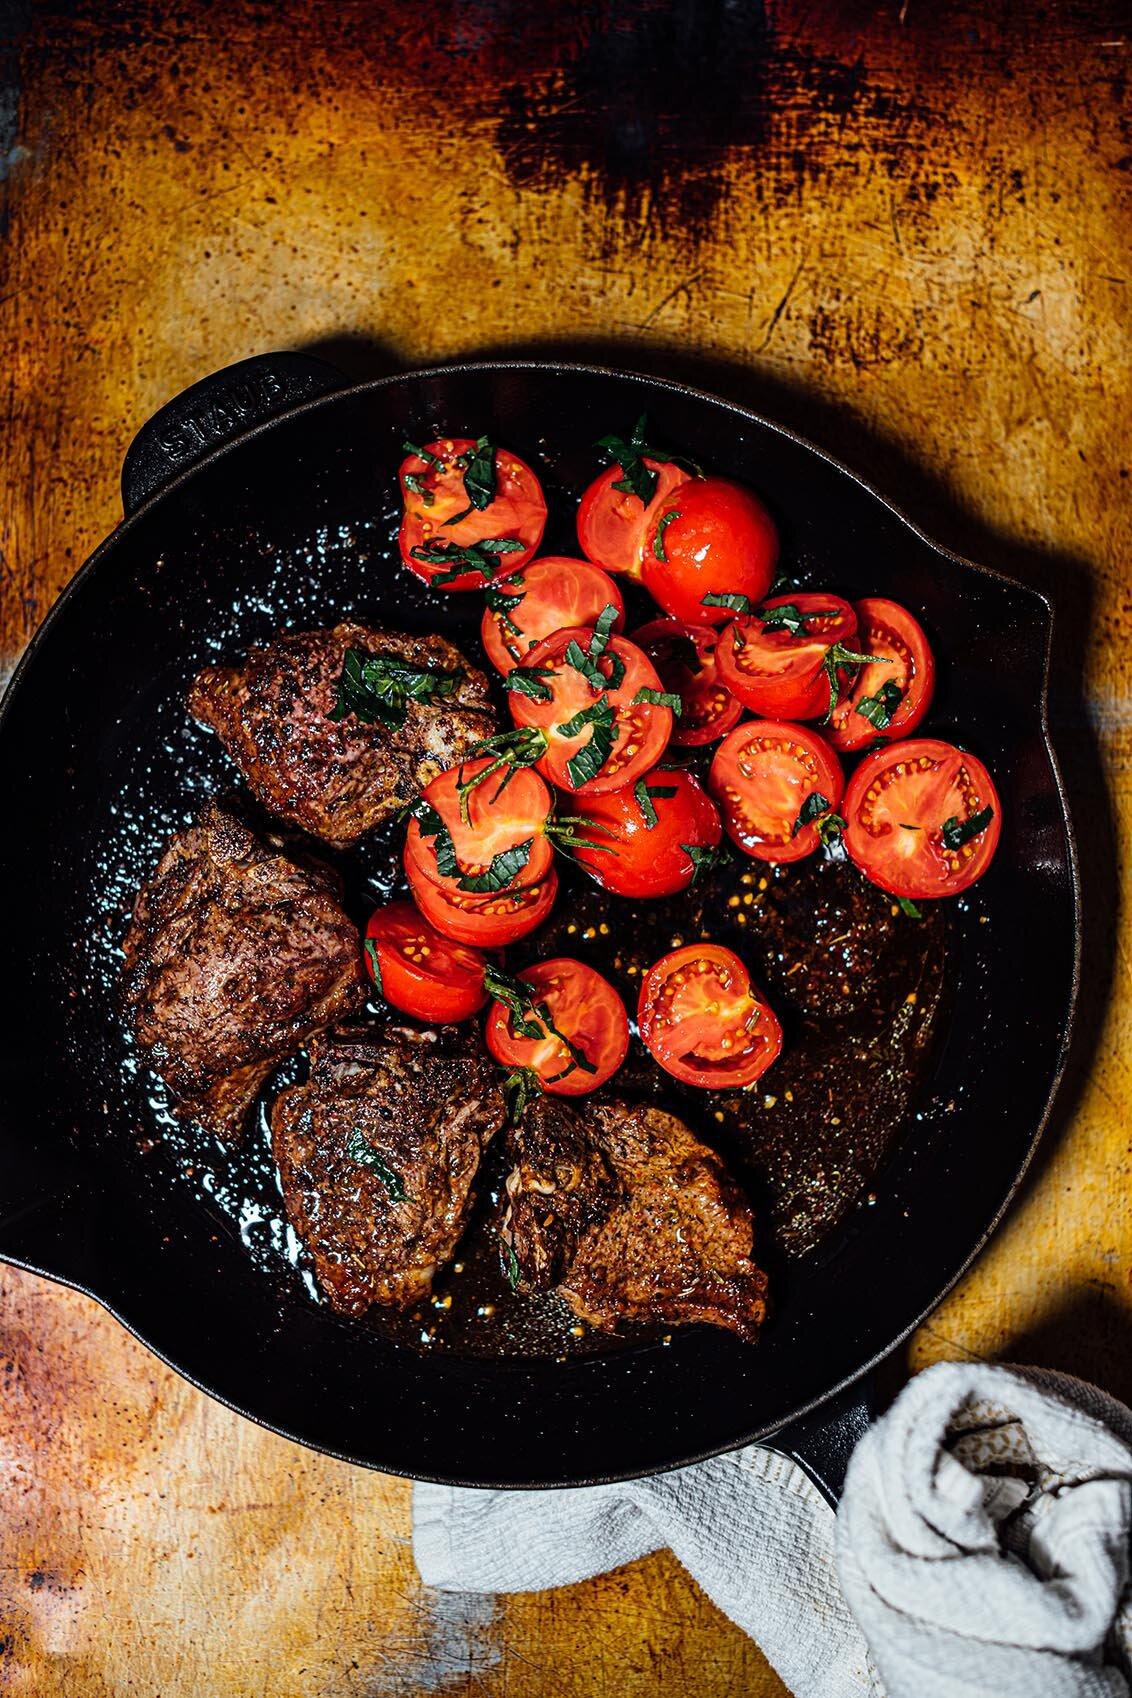 lamb chops recipe tomato spicy lamb chops with tomatoes and mint — Nik Sharma